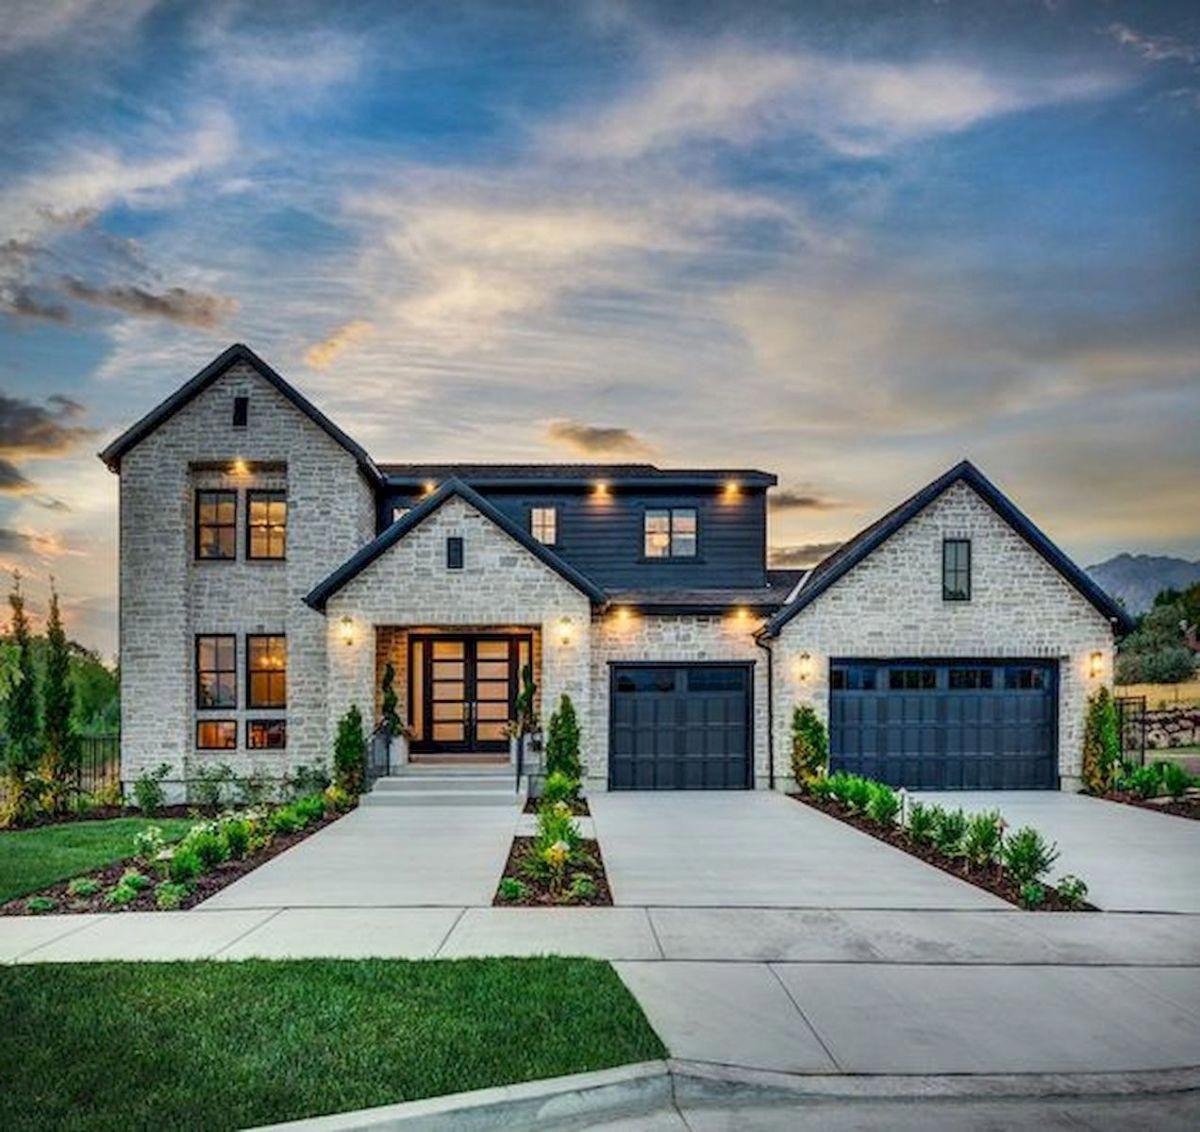 33 beautiful modern farmhouse exterior design ideas on beautiful modern farmhouse trending exterior design ideas id=27766